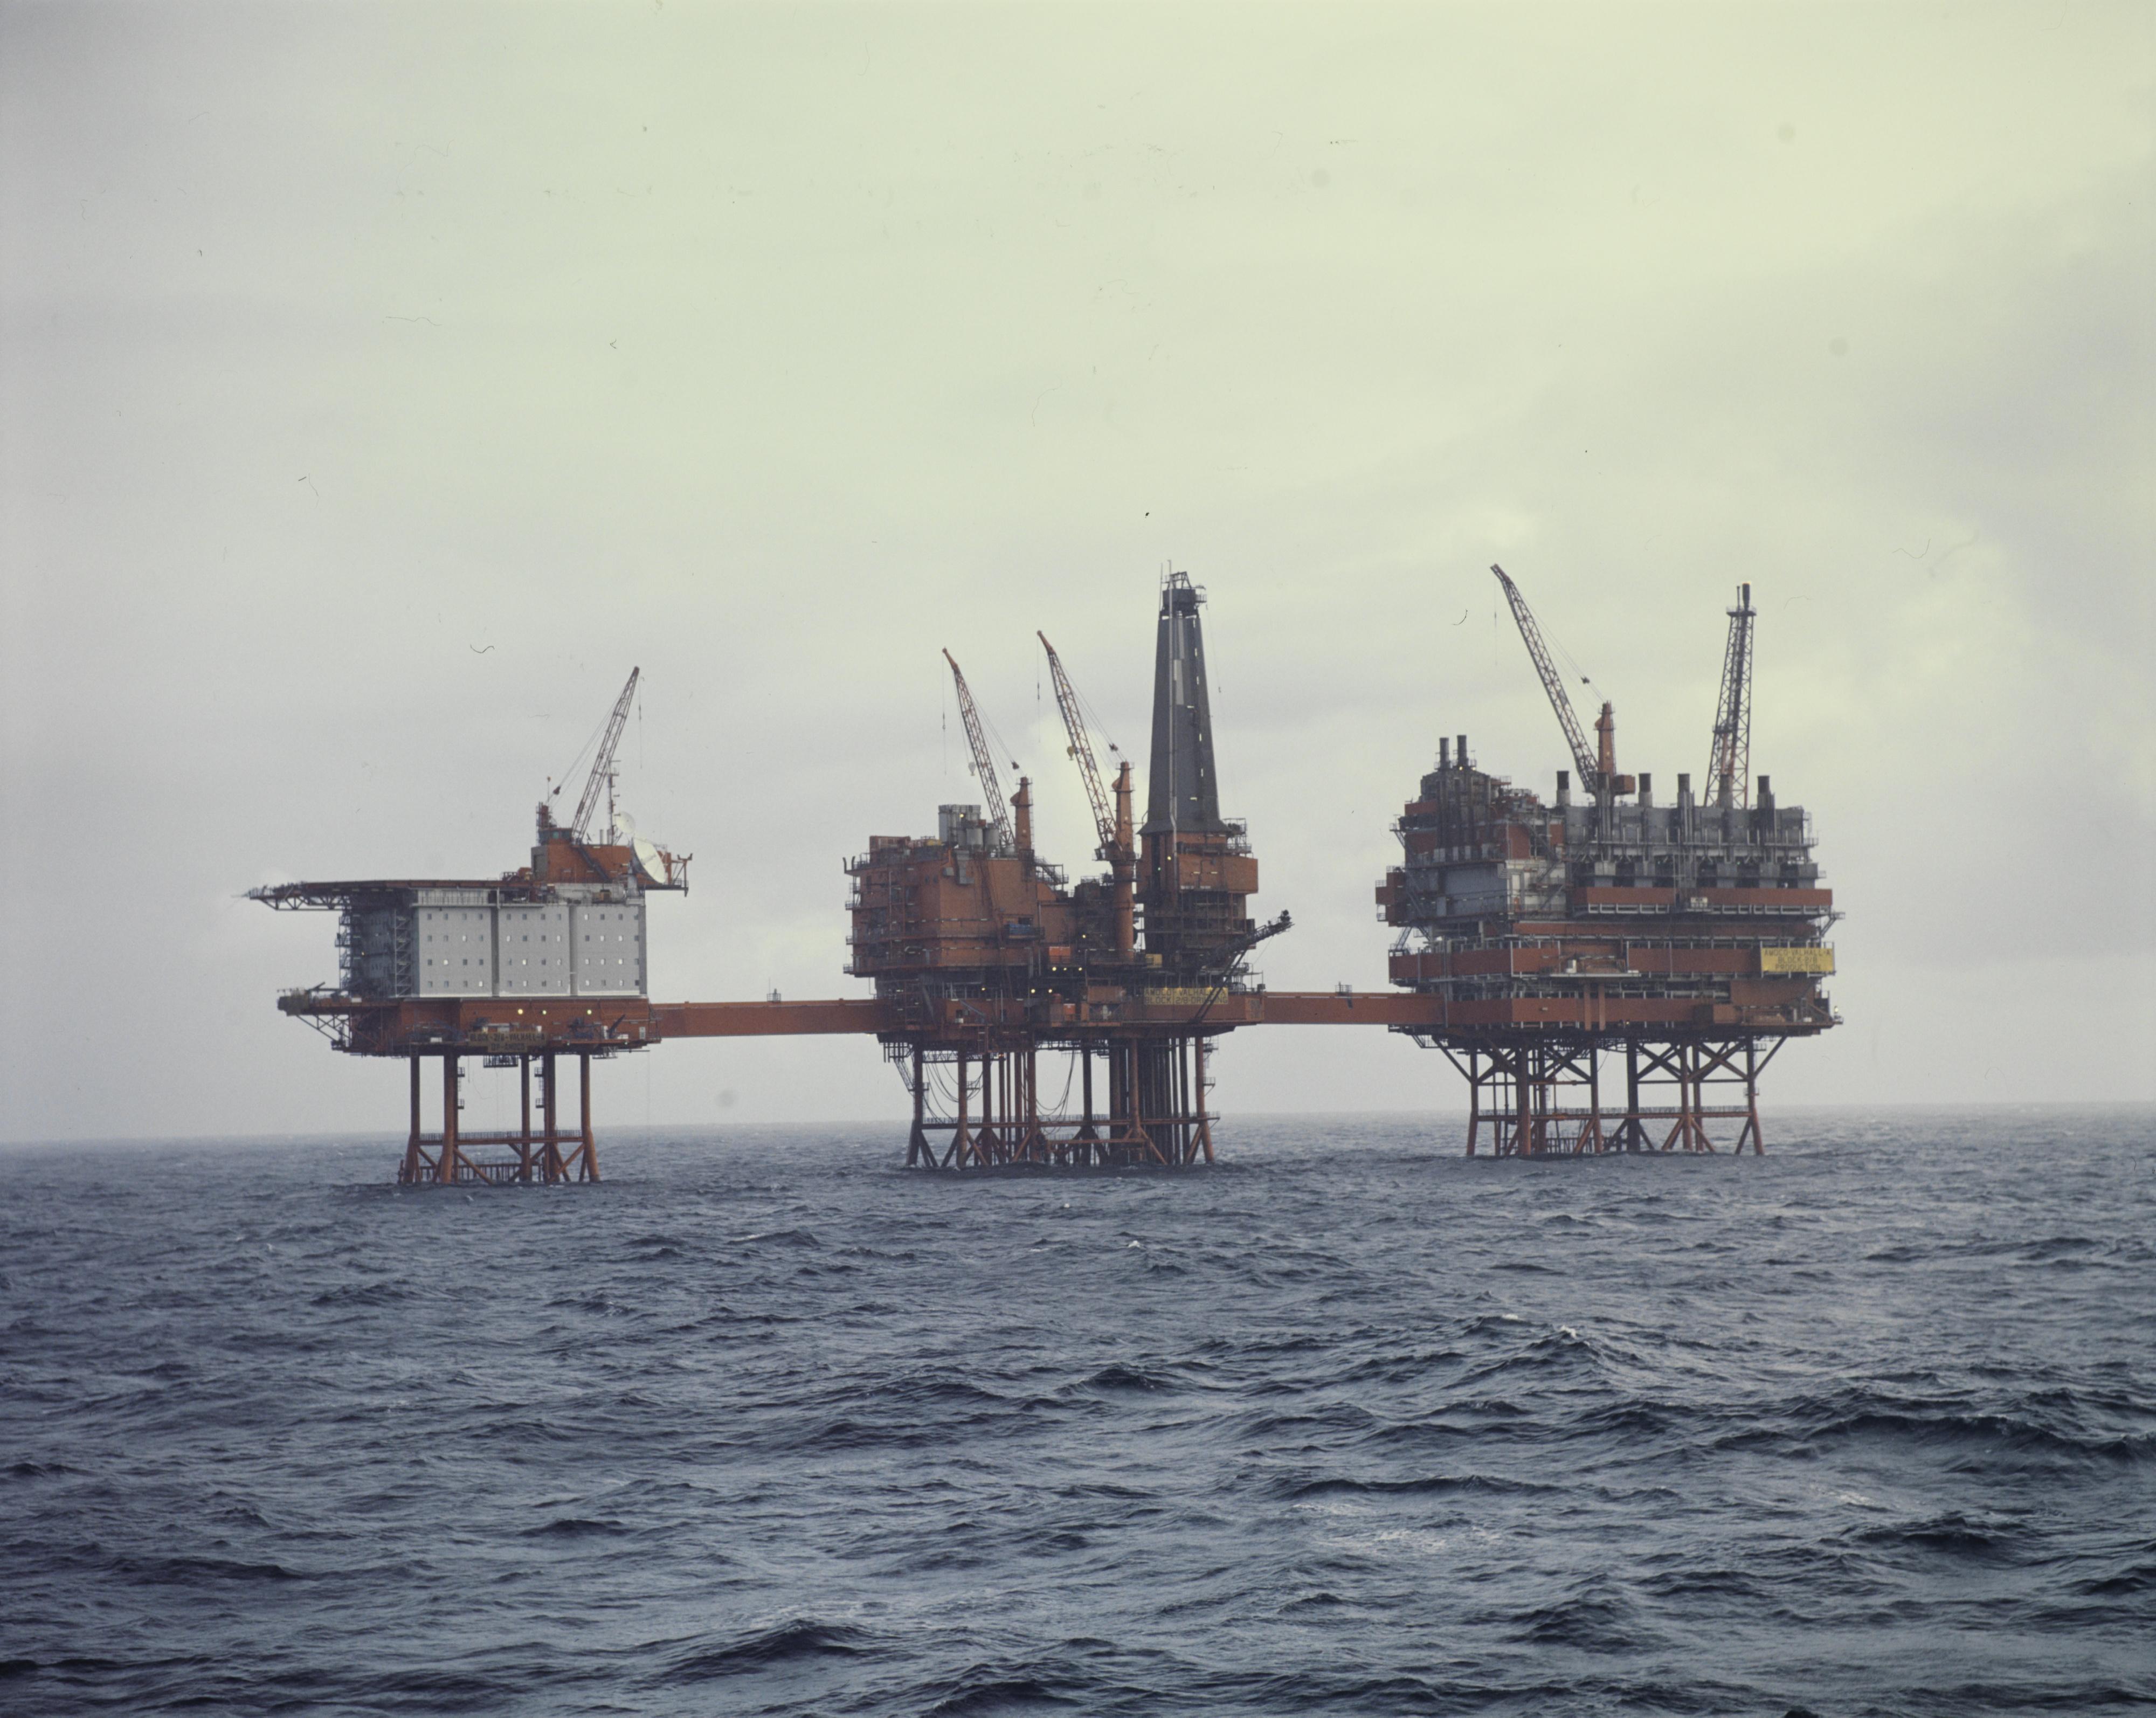 Valhall oil field - Wikipedia